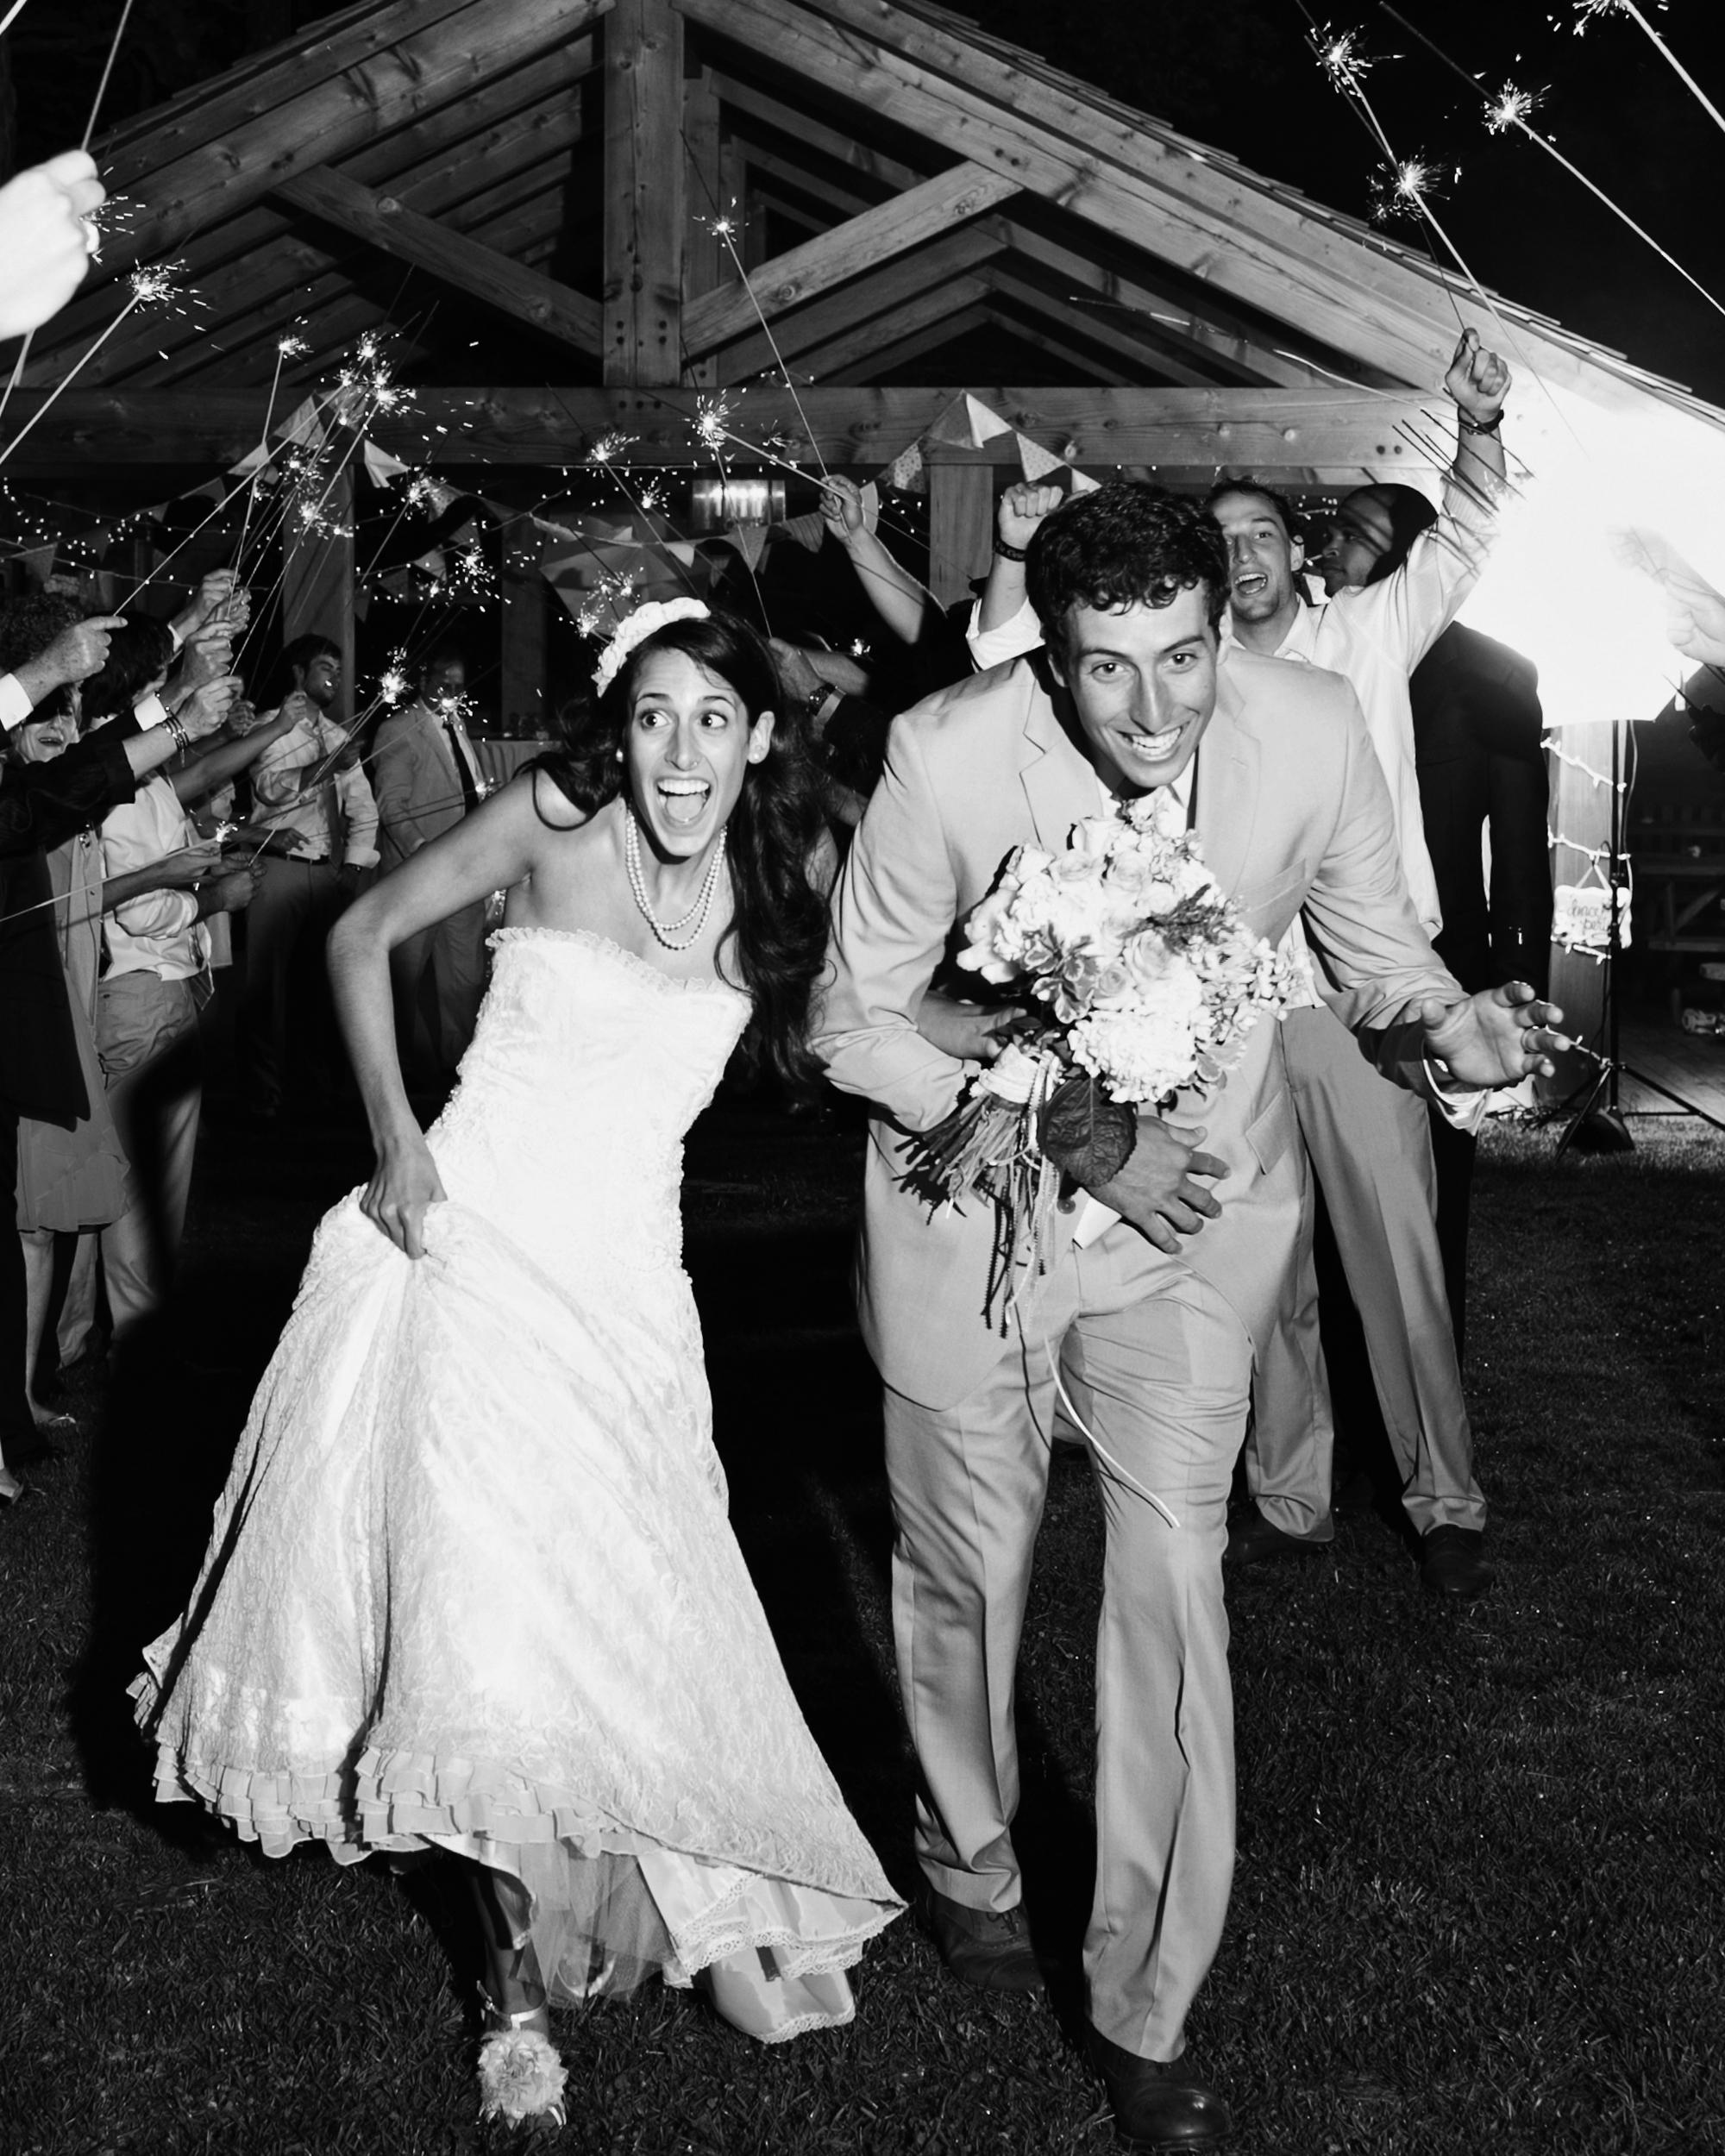 real-weddings-abby-julian-0711-736.jpg